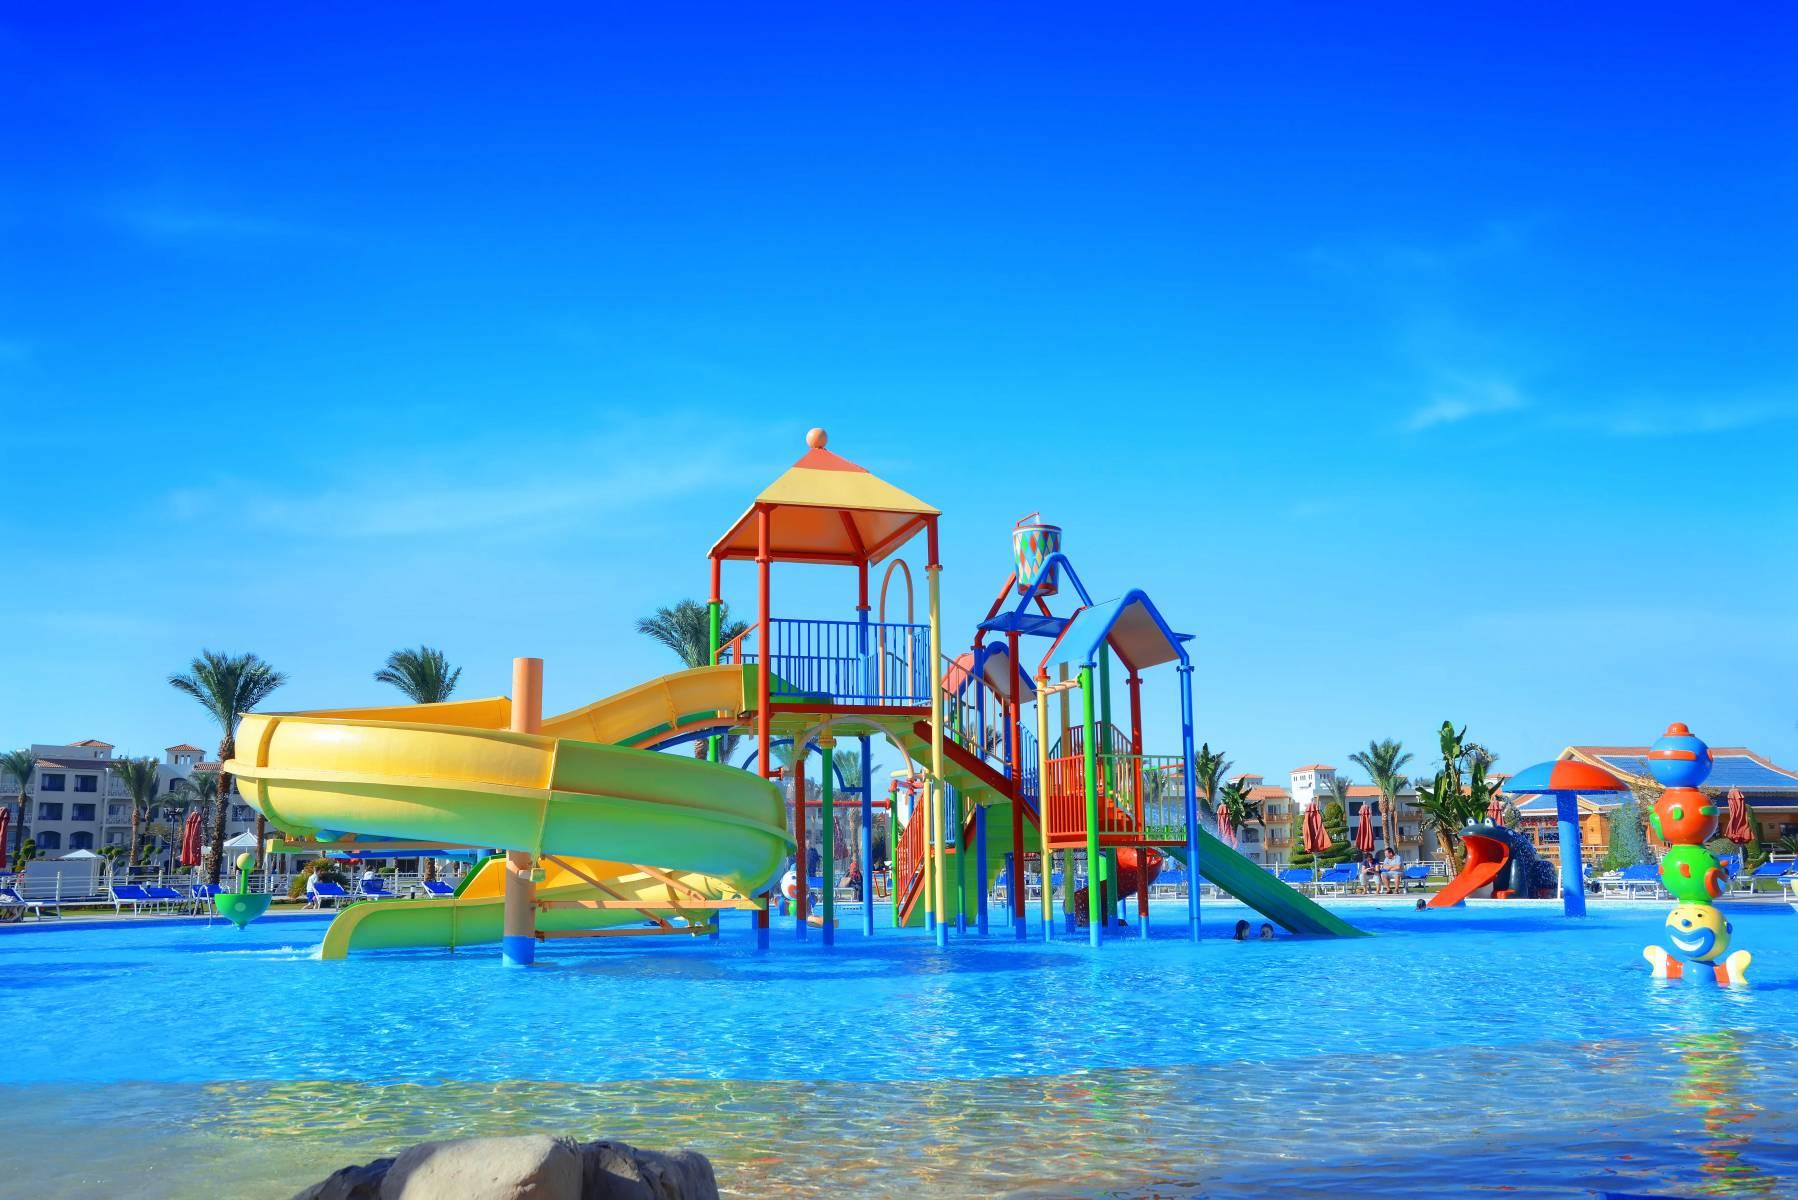 Hotels Resorts Dana Beach Resort Pickalbatros Hotels Resort In Egypt